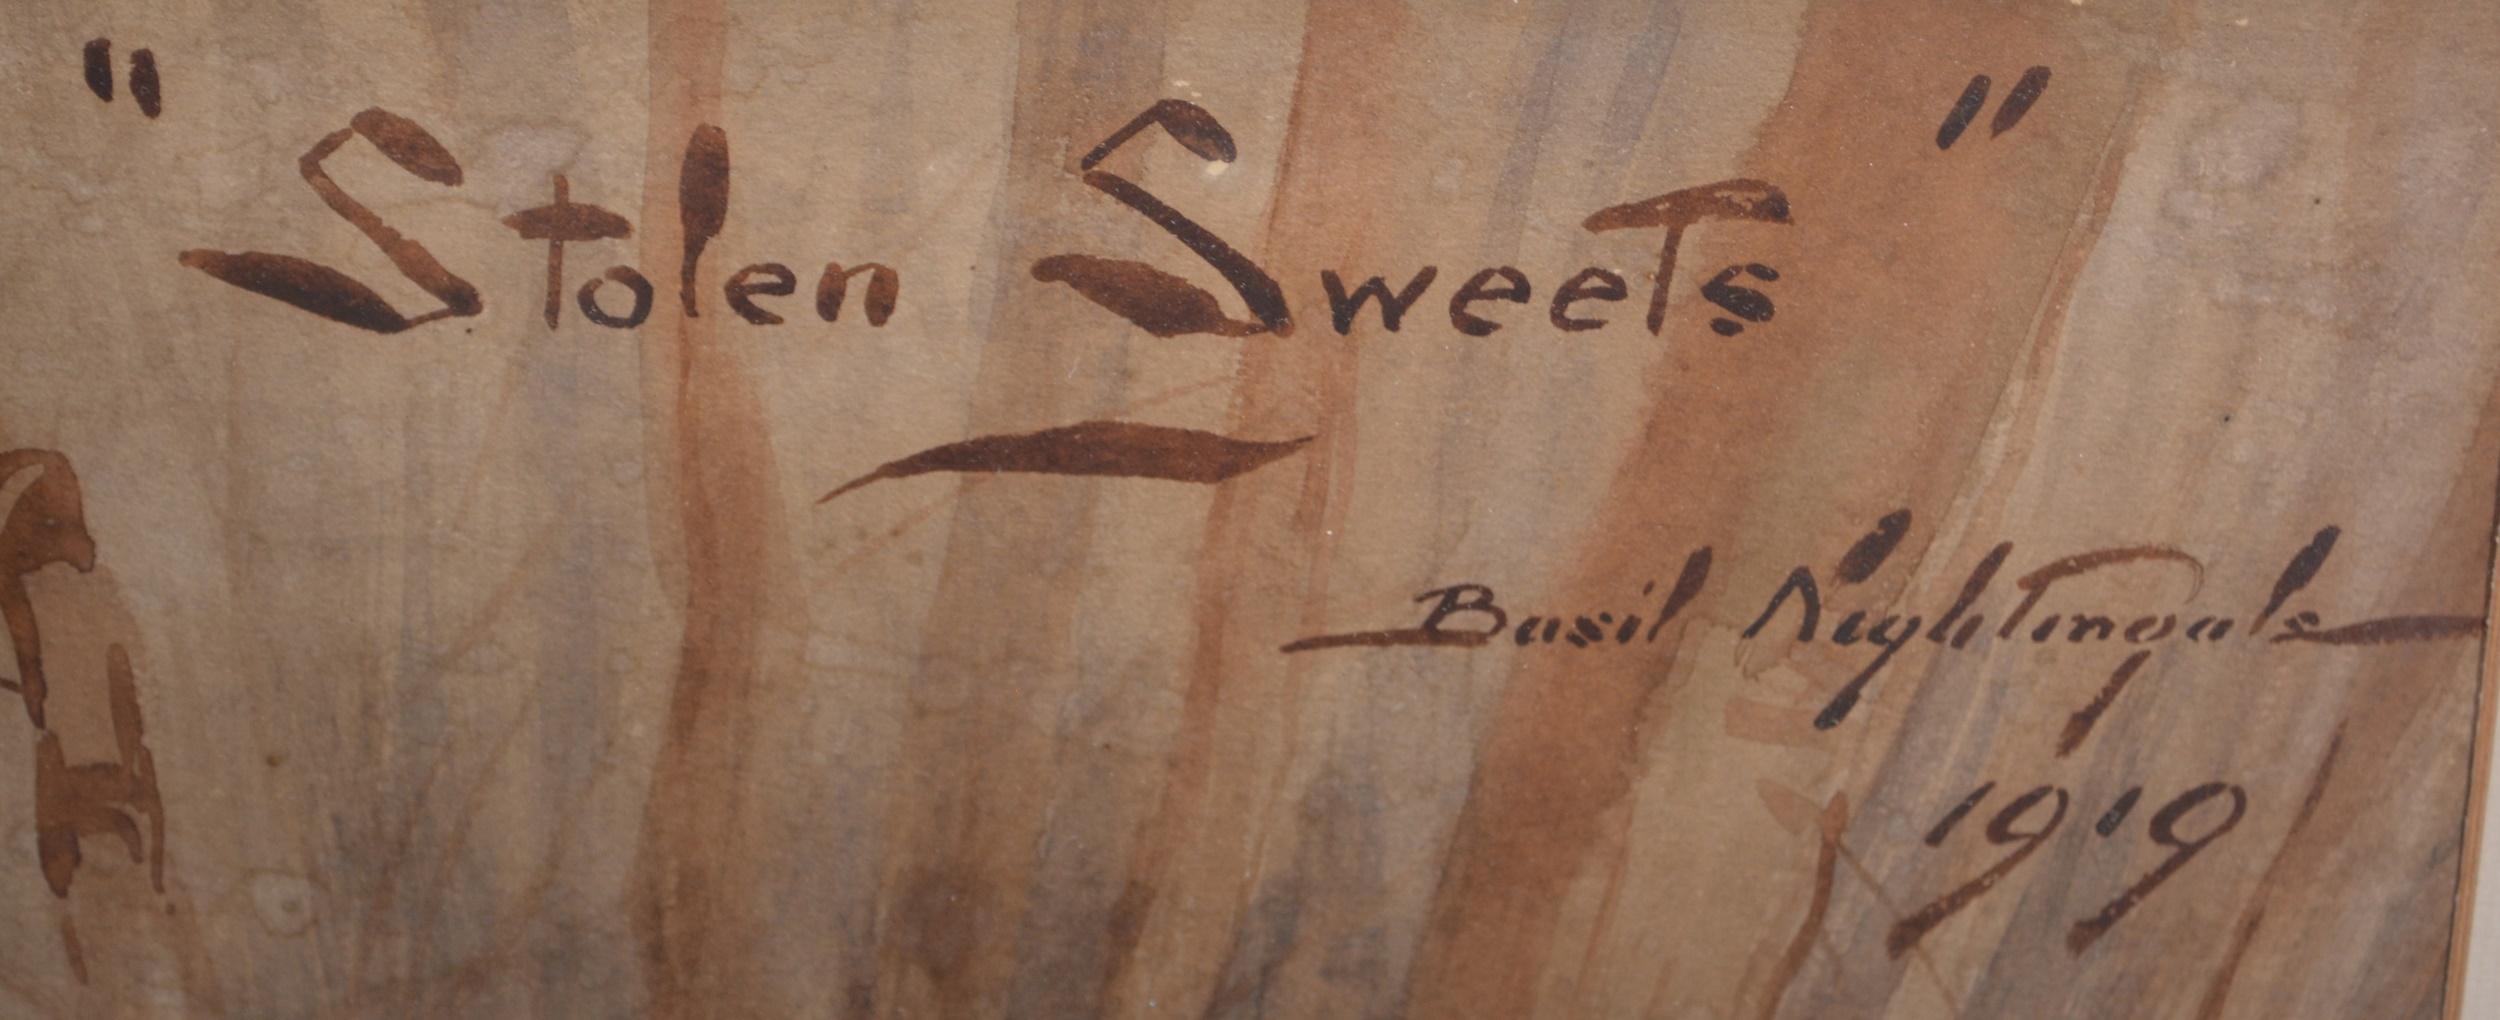 Basil Nightingale, Stolen Sweets - Image 3 of 4